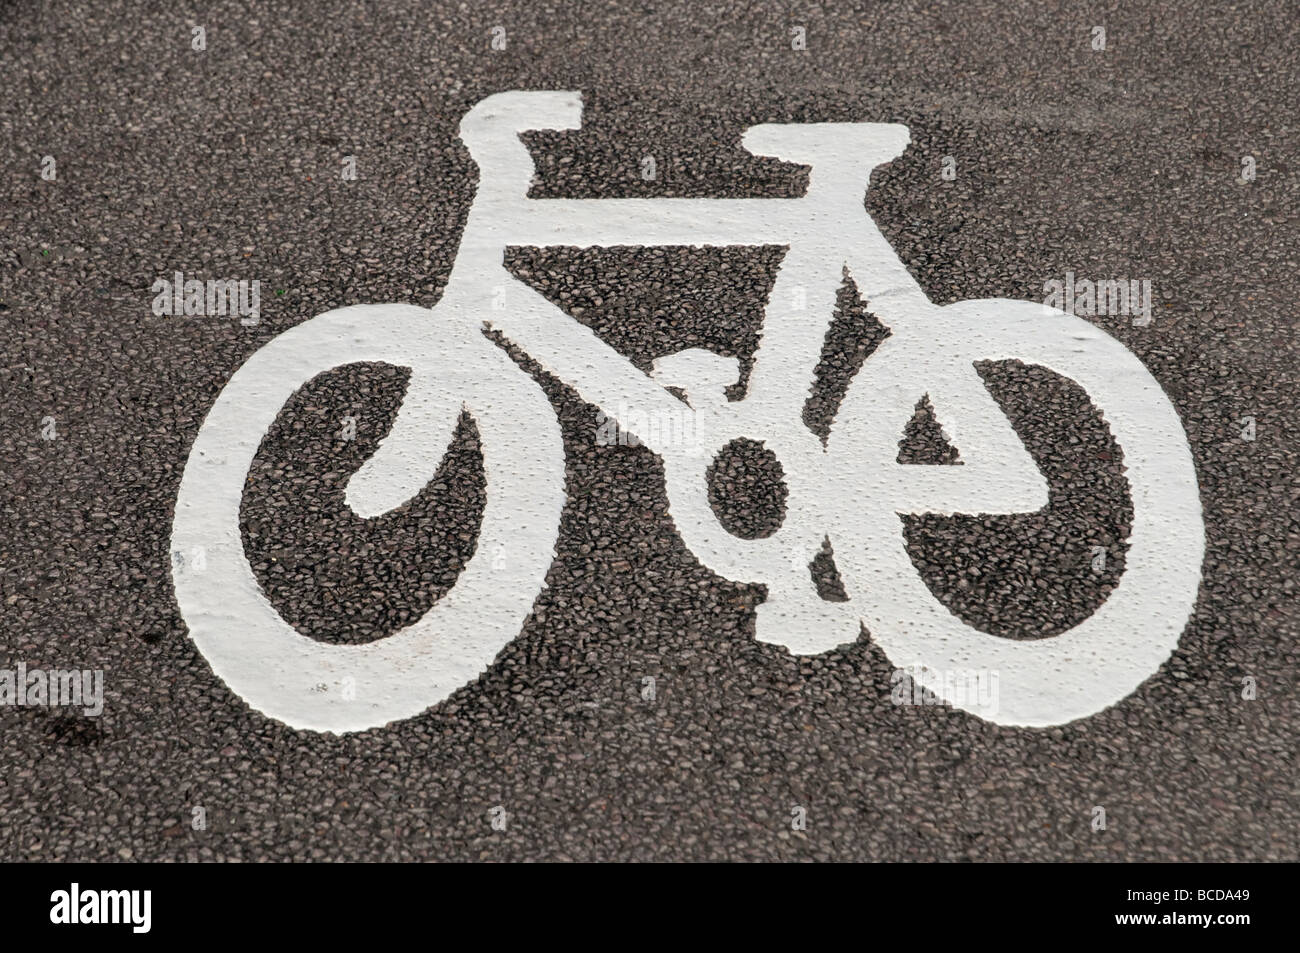 Cycle lane symbol road marking London England UK - Stock Image